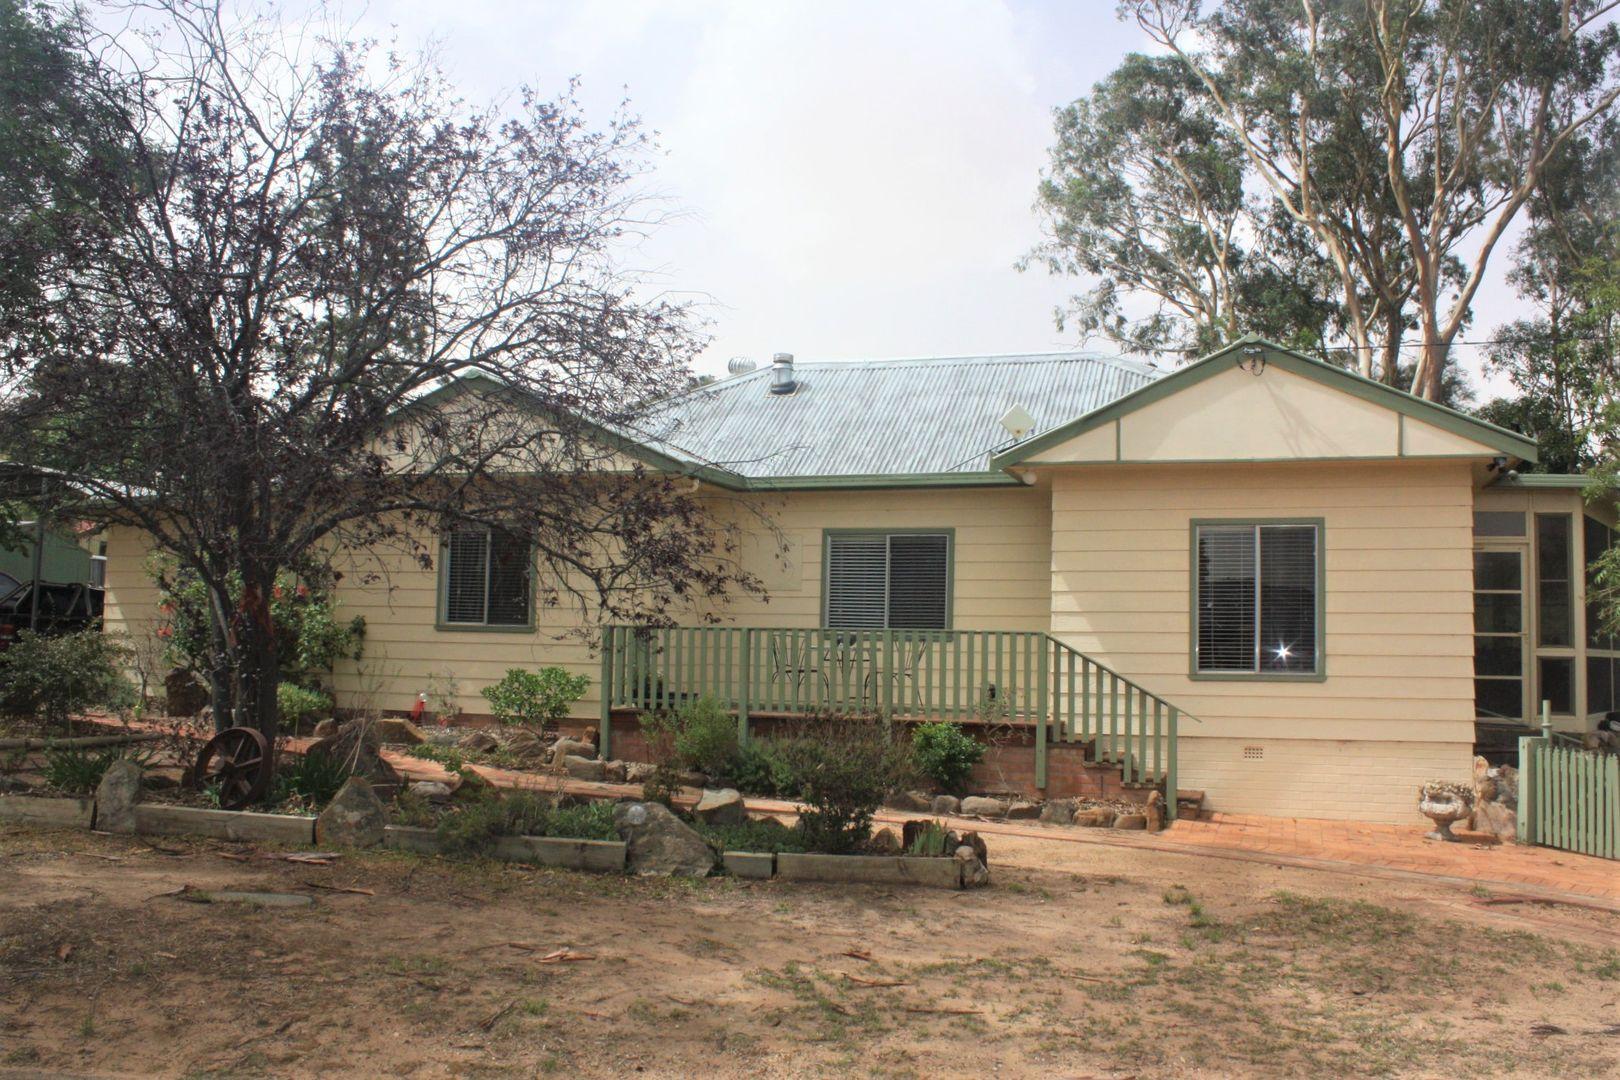 23-25 Hospital Street, Coolah NSW 2843, Image 1